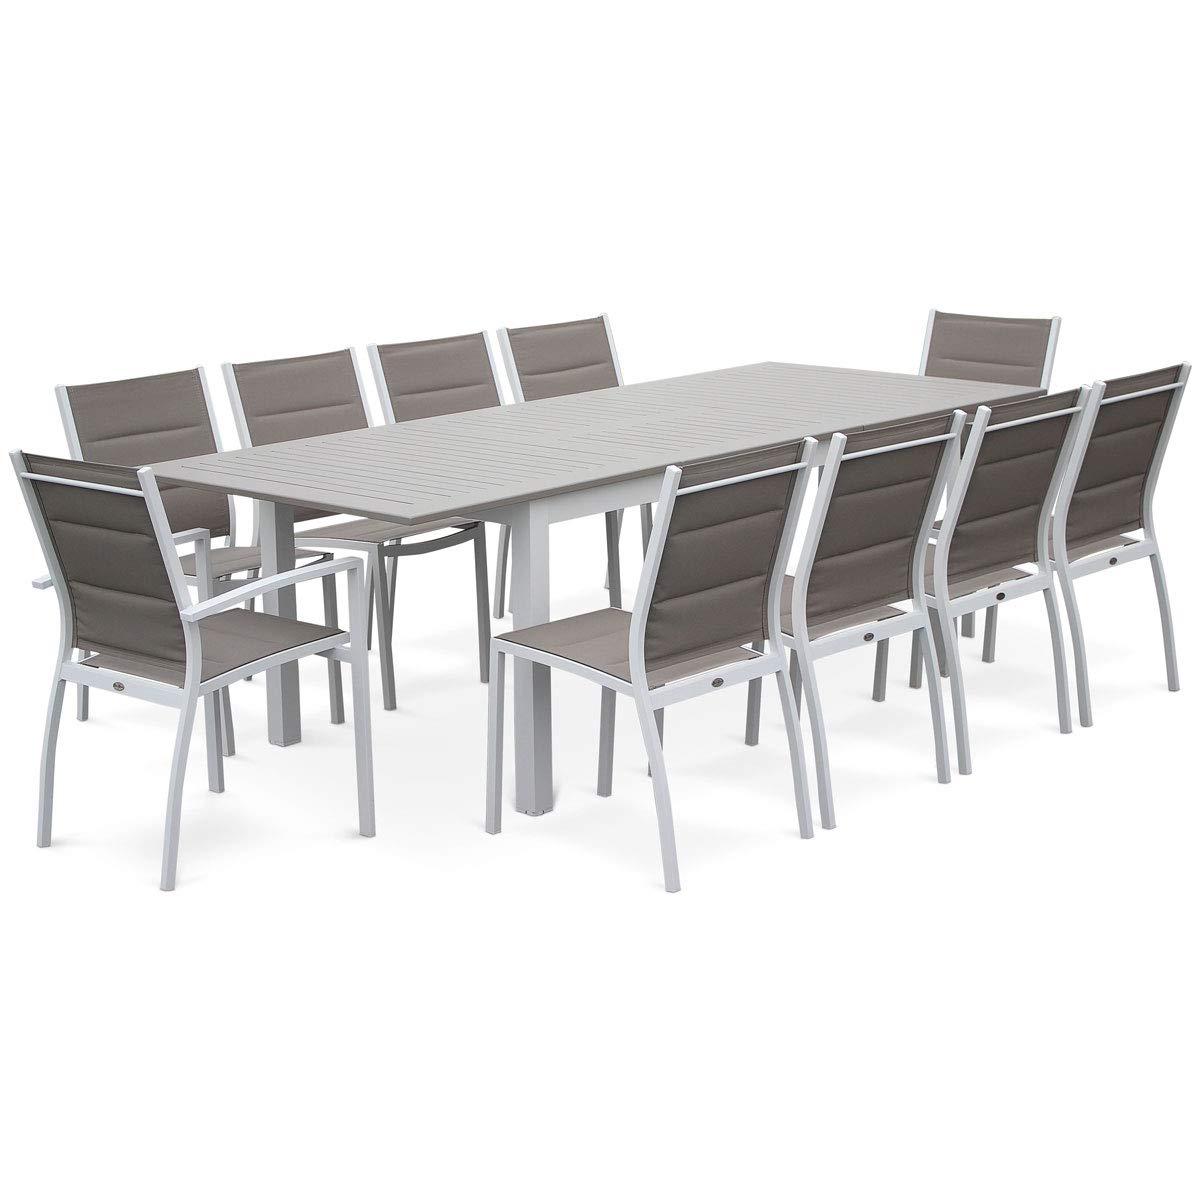 Amazon.de: Alice \'s Garden - Lounge-Garten Tisch ausziehbar ...